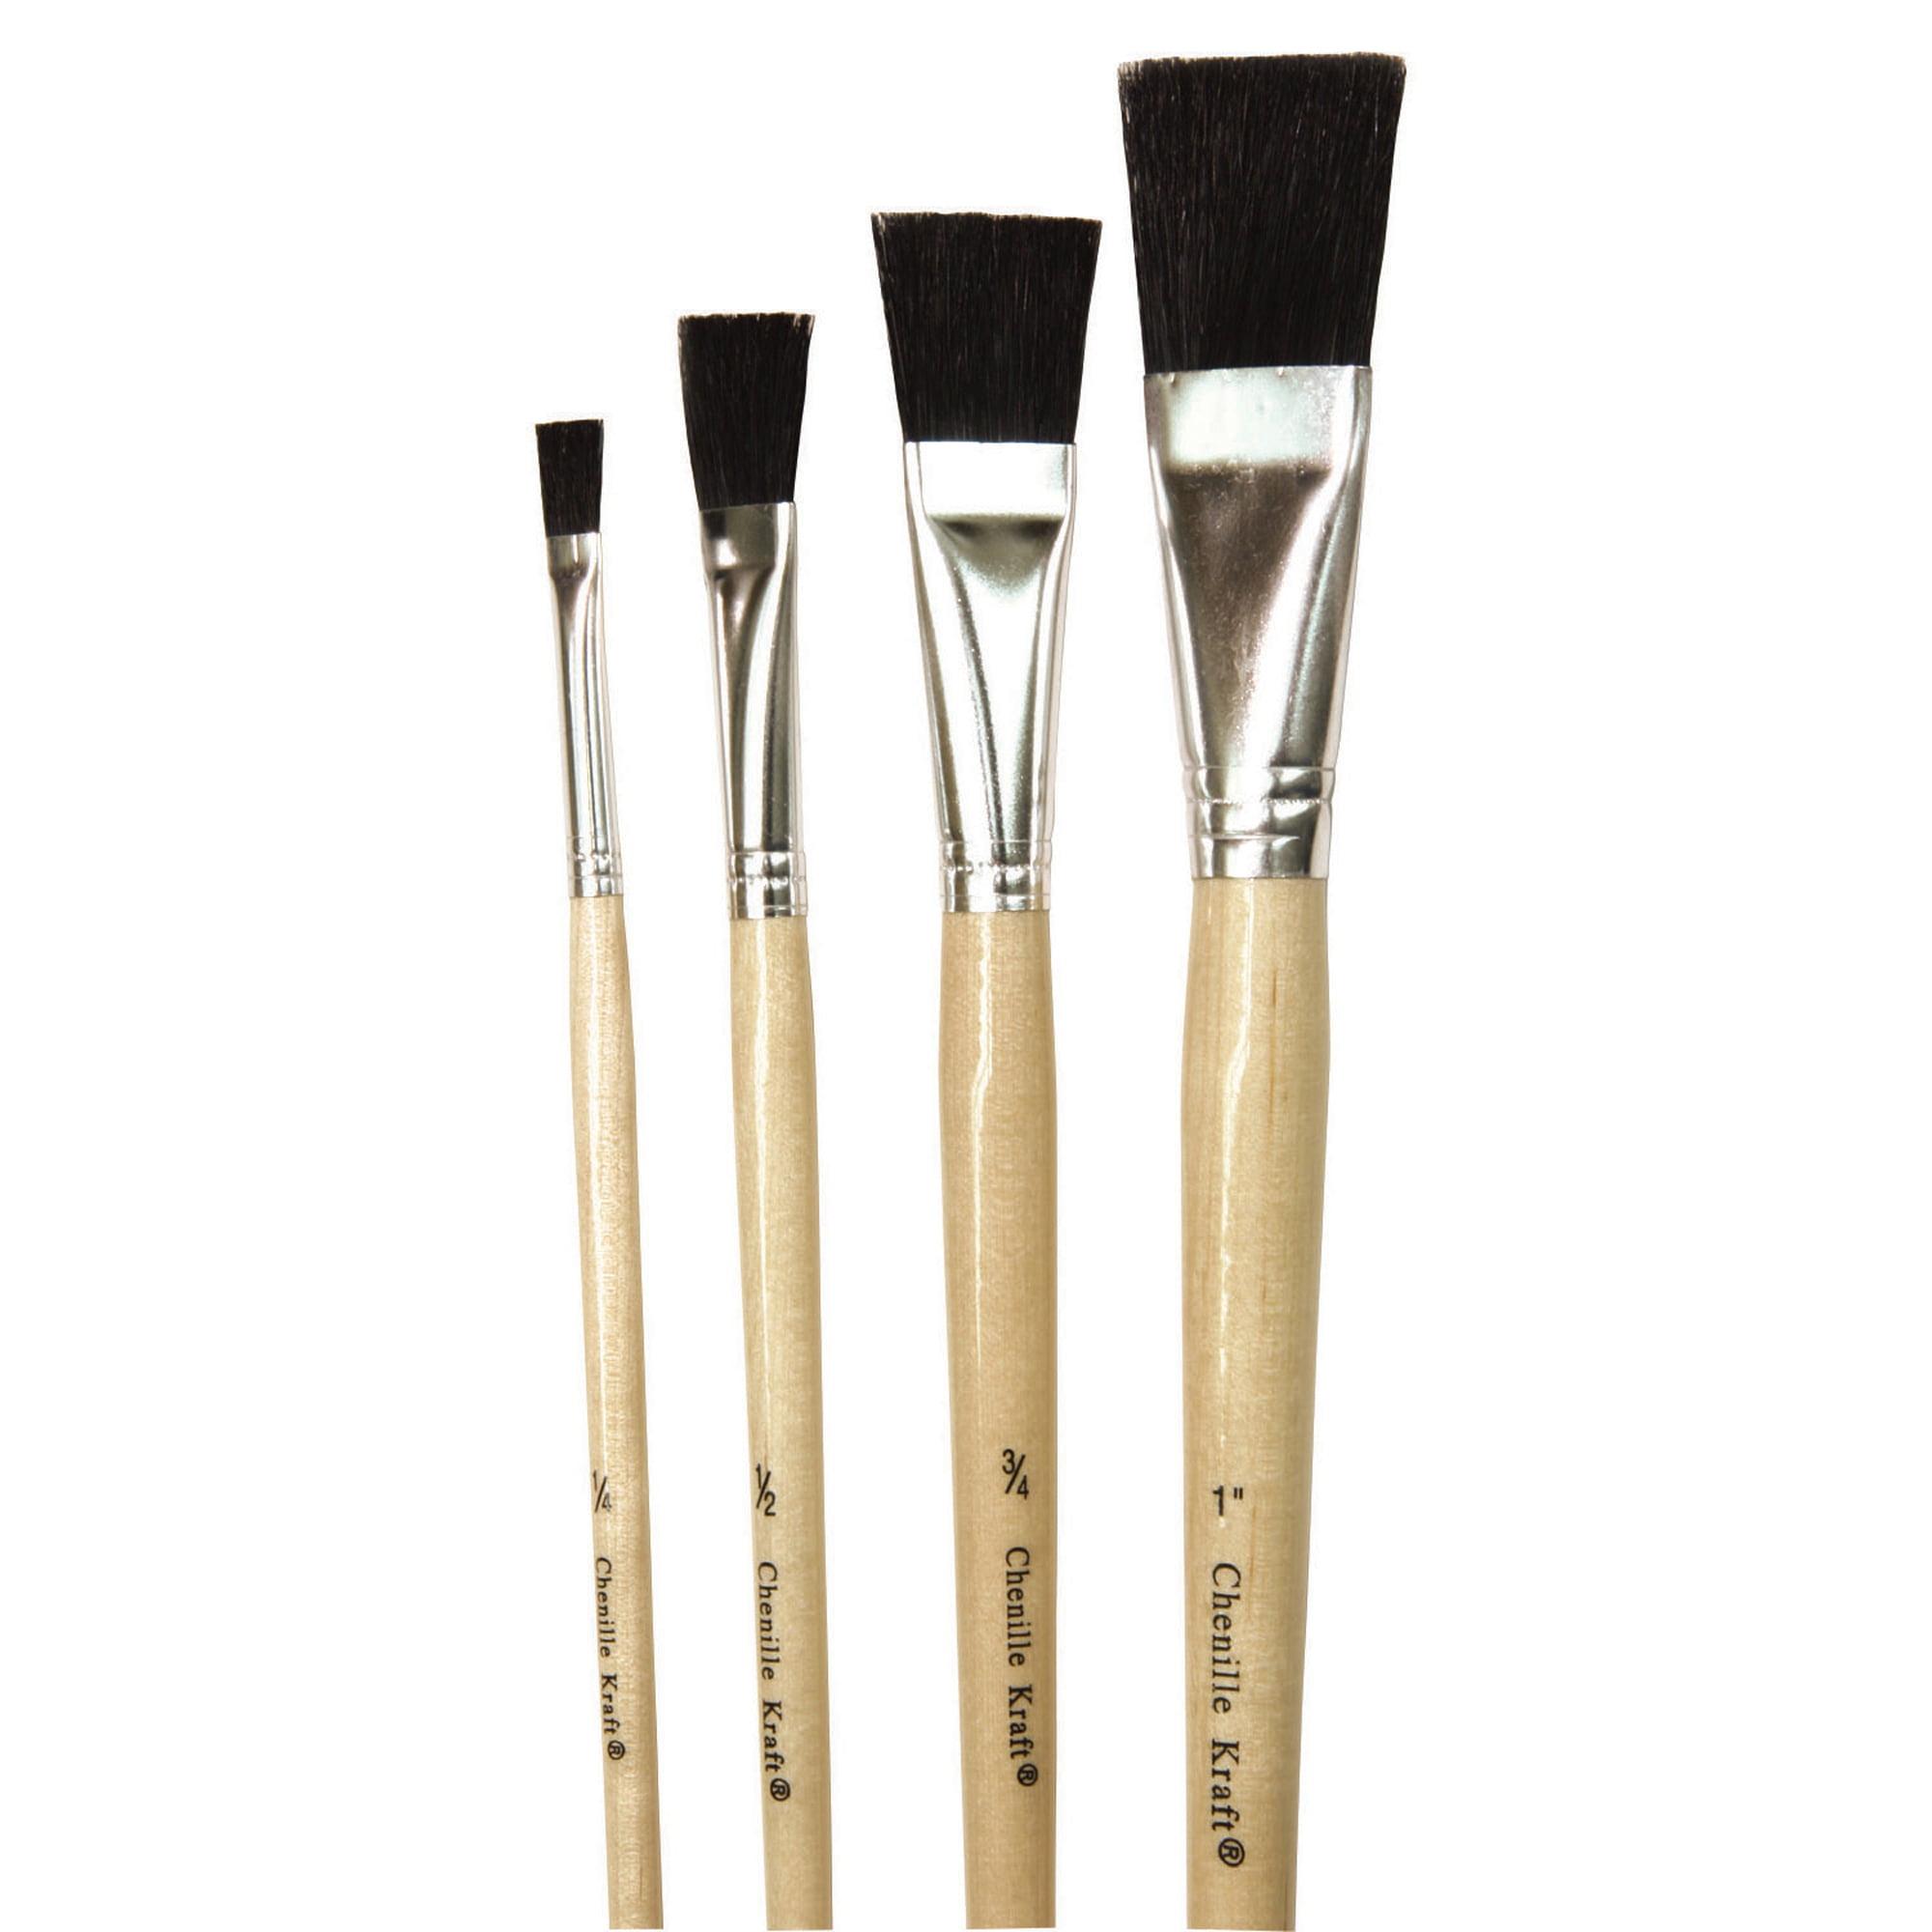 "Easel Brush, Black Bristle, 1/4, 1/2, 3/4 & 1"" - 4 per pack, 10 packs"